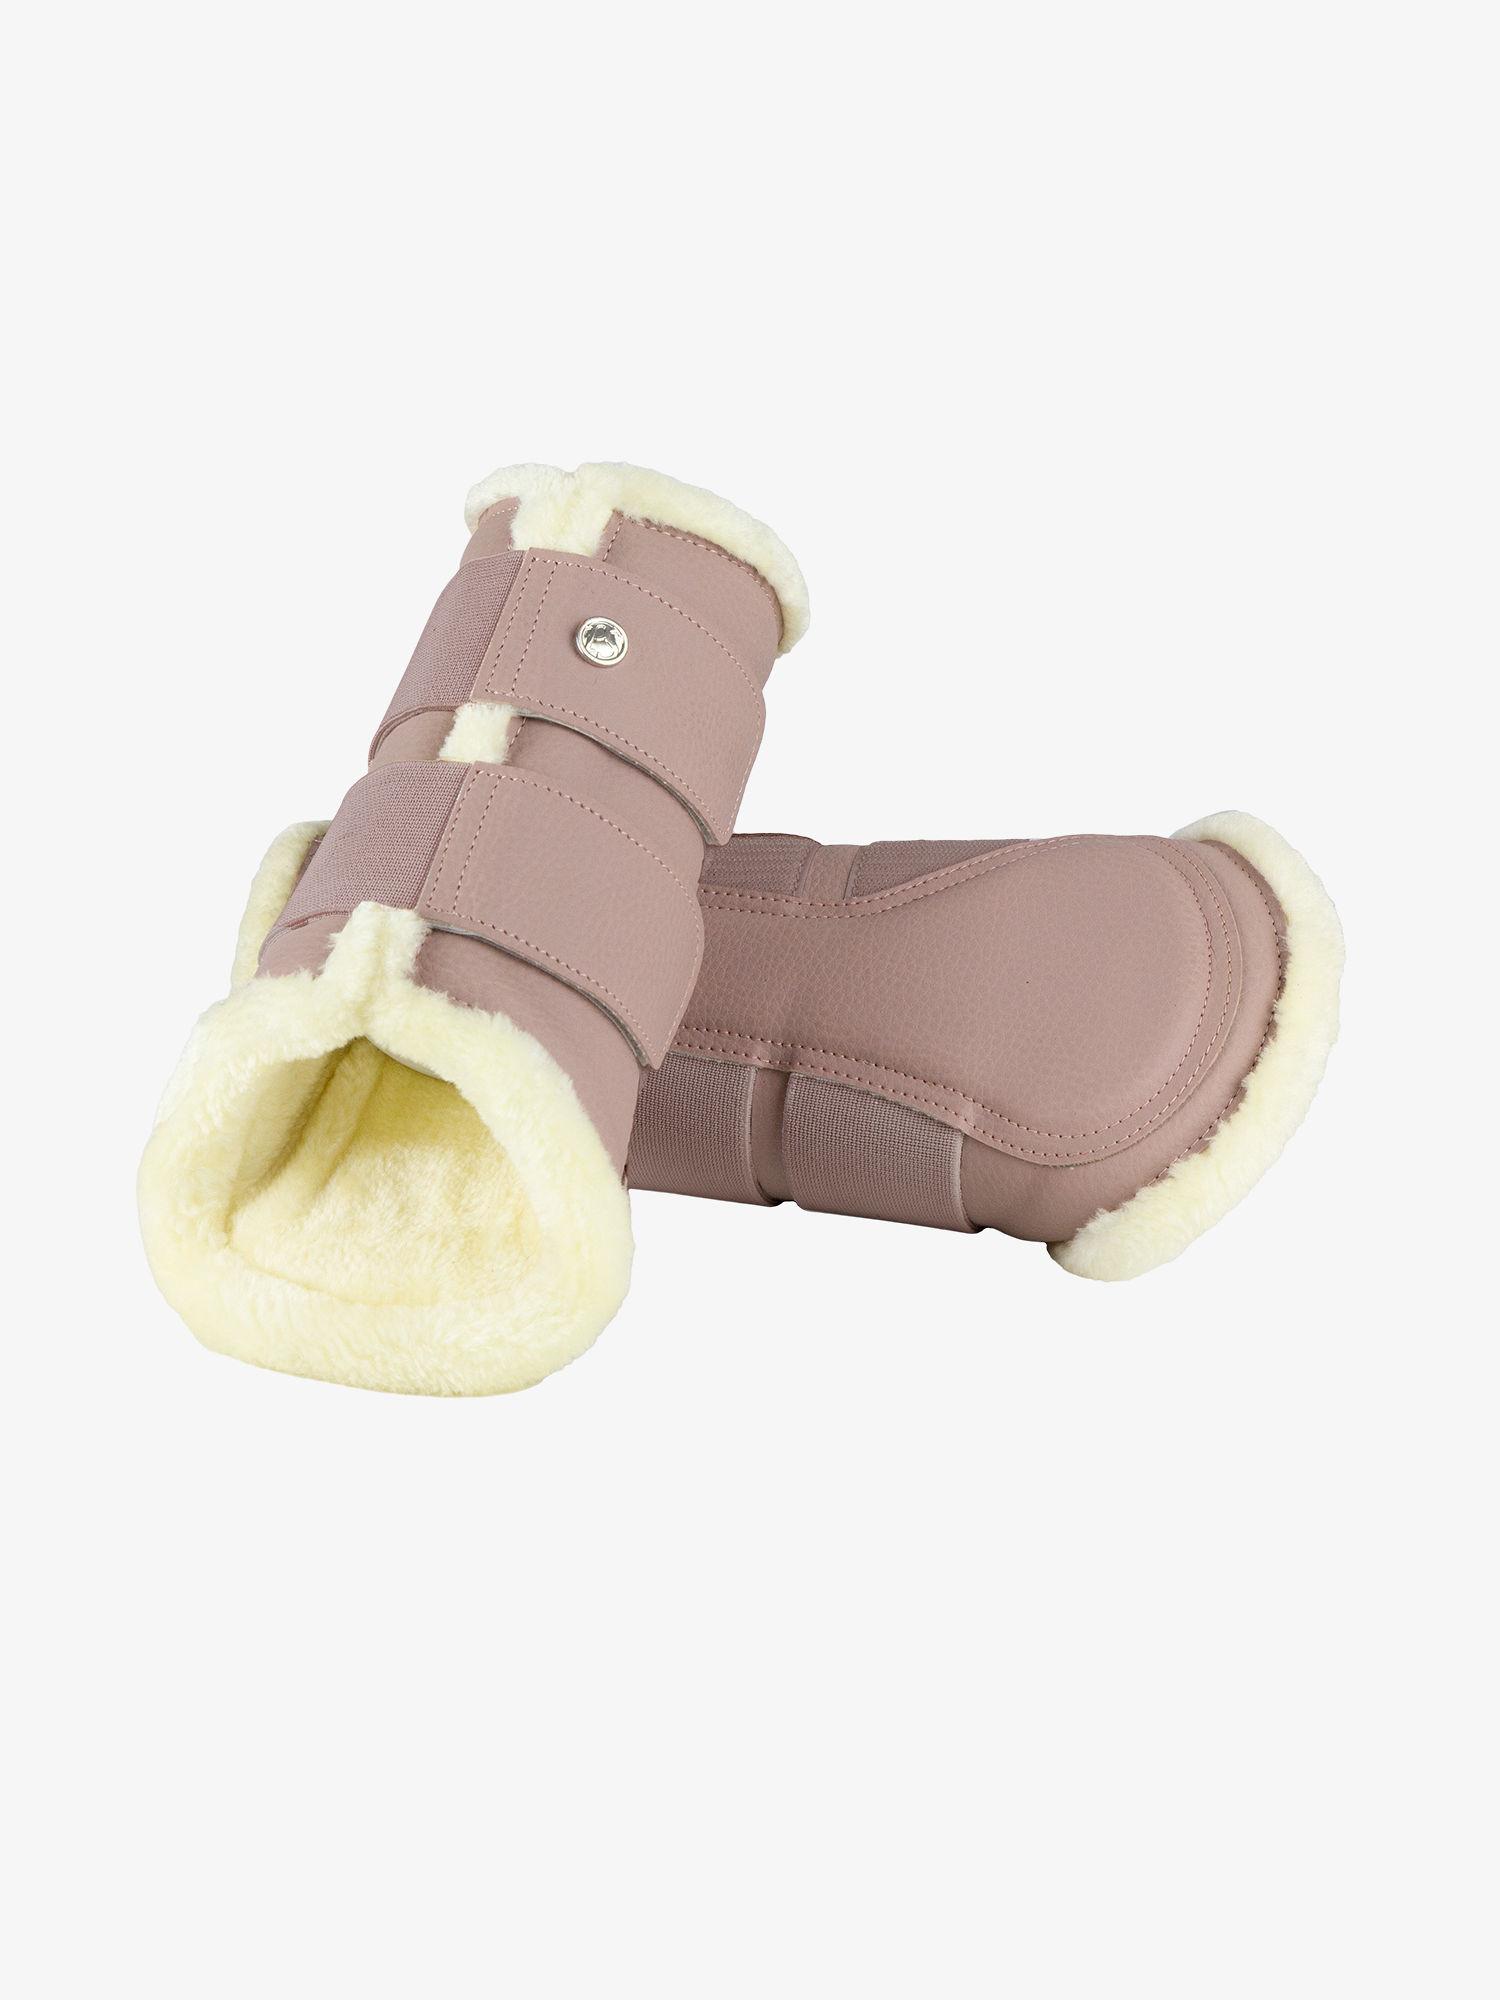 PS of Sweden 4er Set Gamaschen, Brushing Boots in Pink